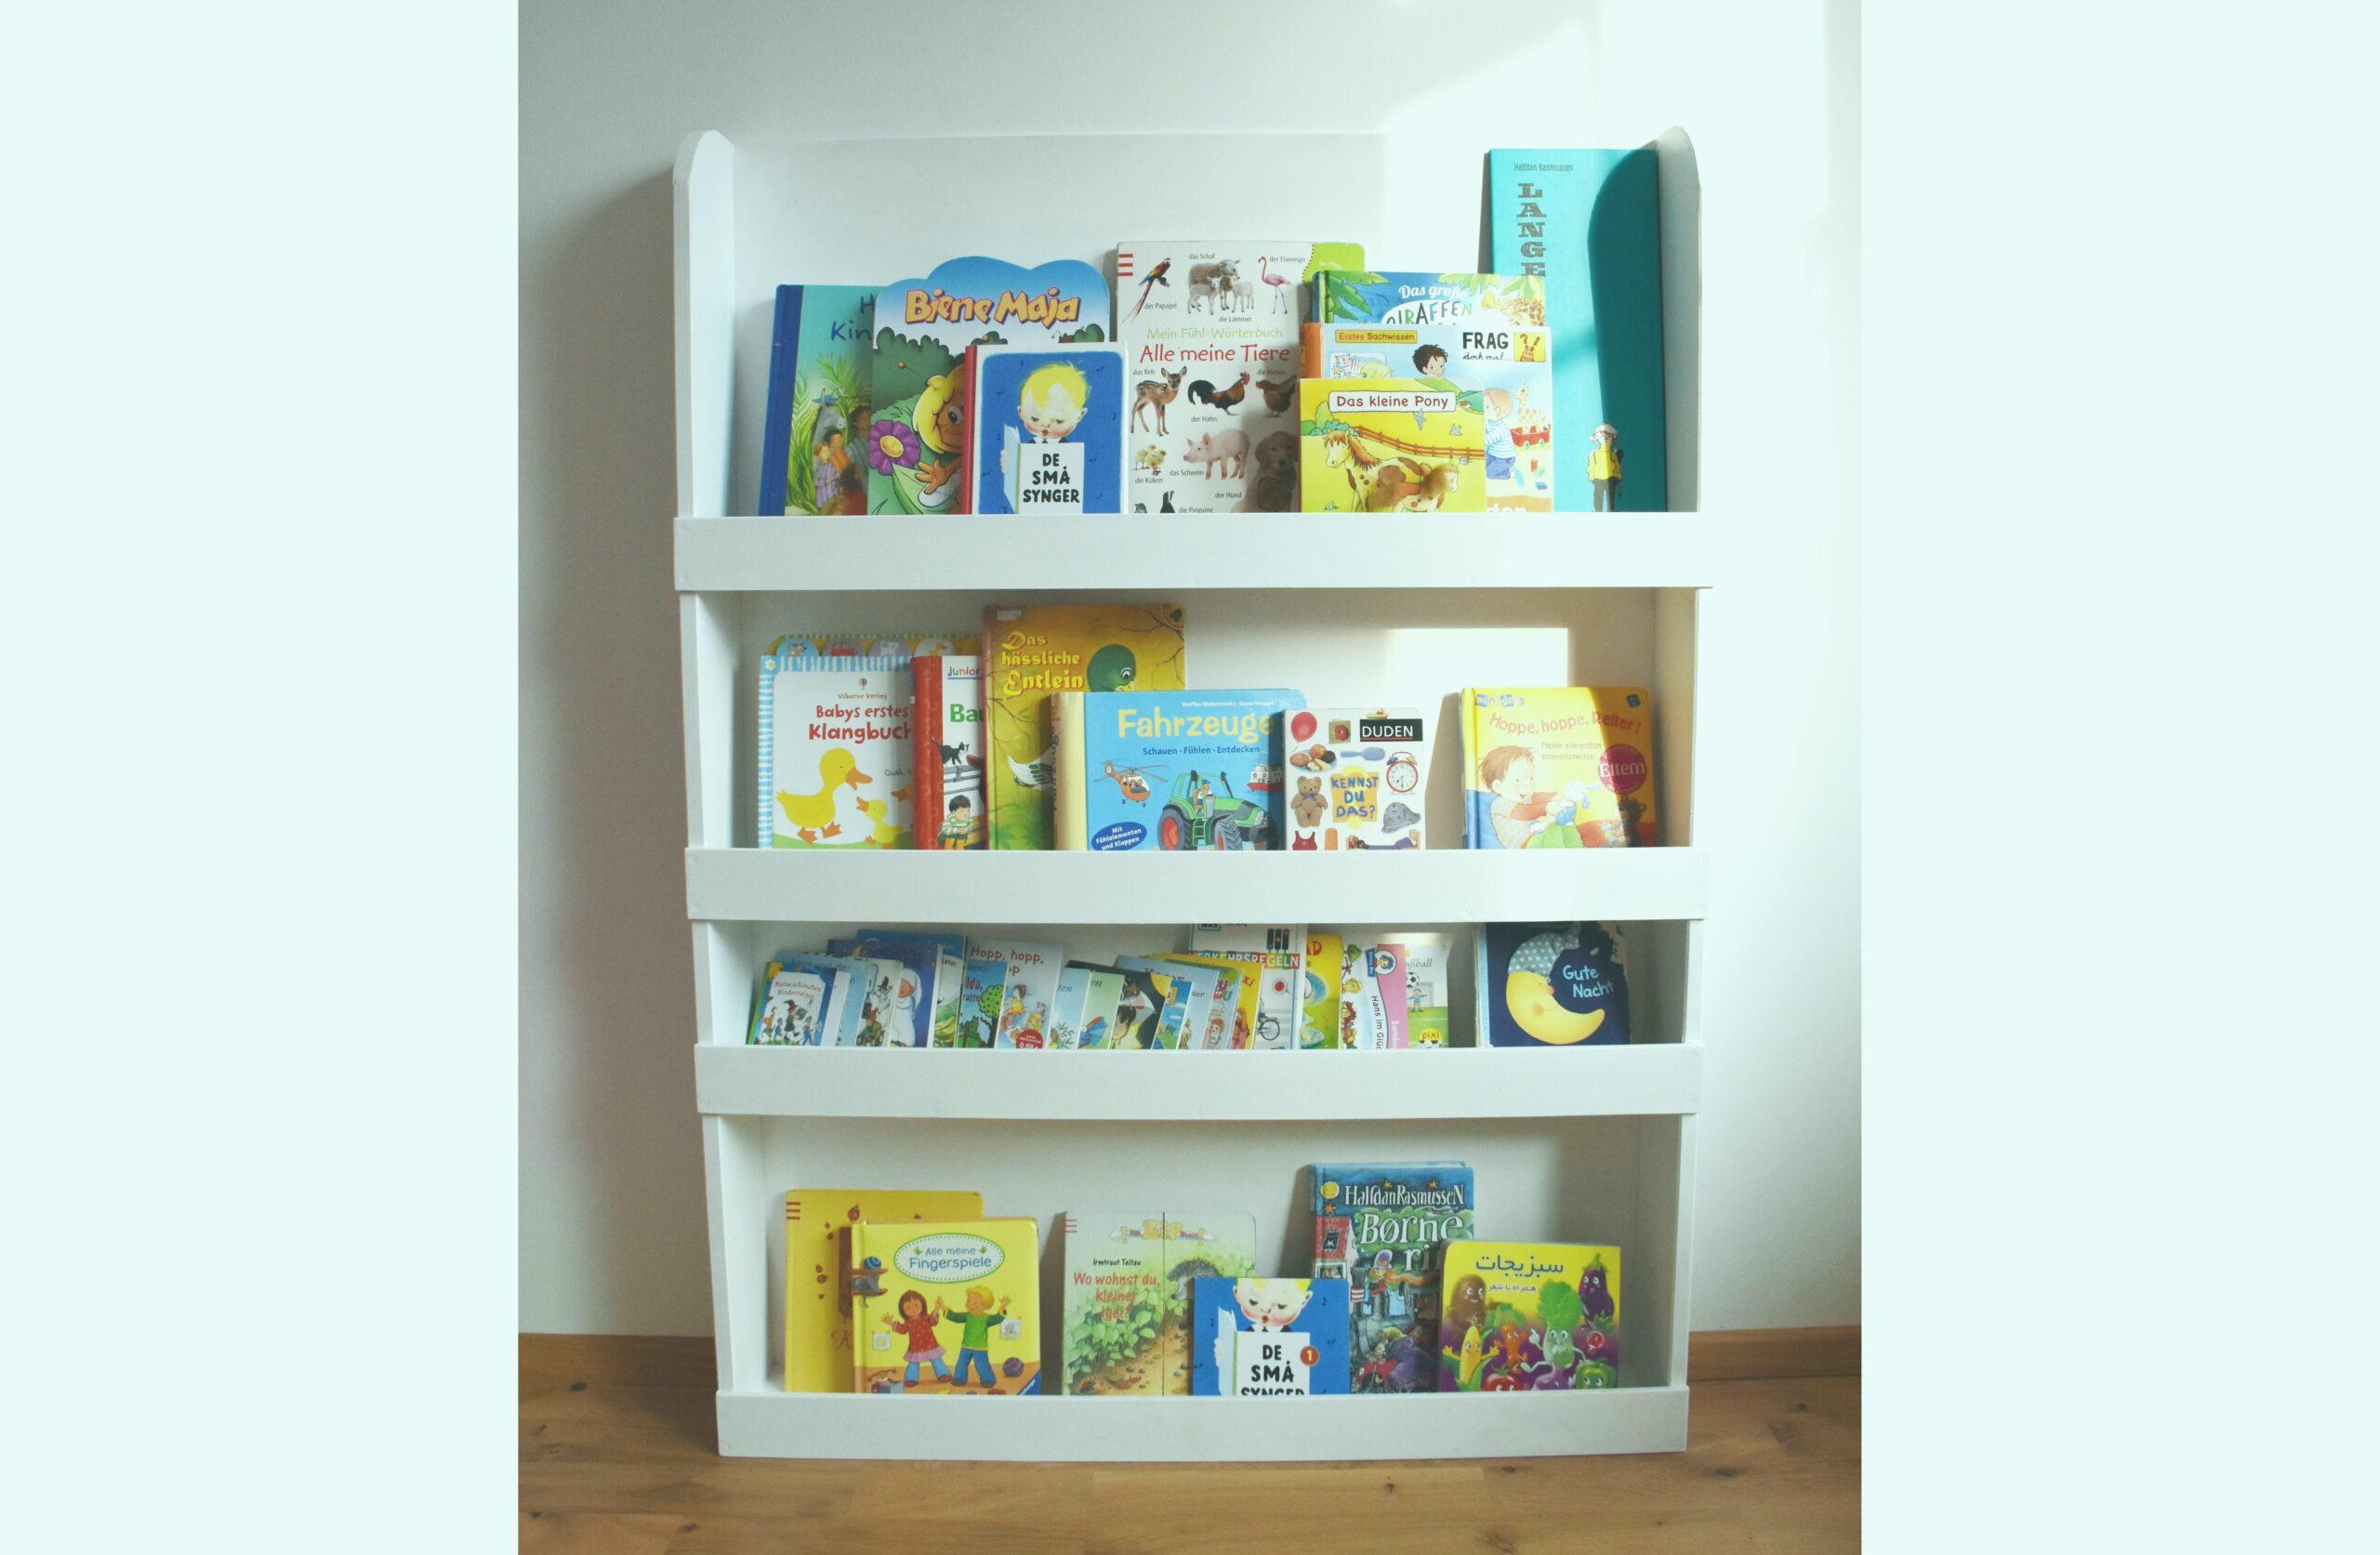 Full Size of Bücherregal Kinderzimmer Aufbewahrung Regale Fr New Sofa Regal Weiß Kinderzimmer Bücherregal Kinderzimmer